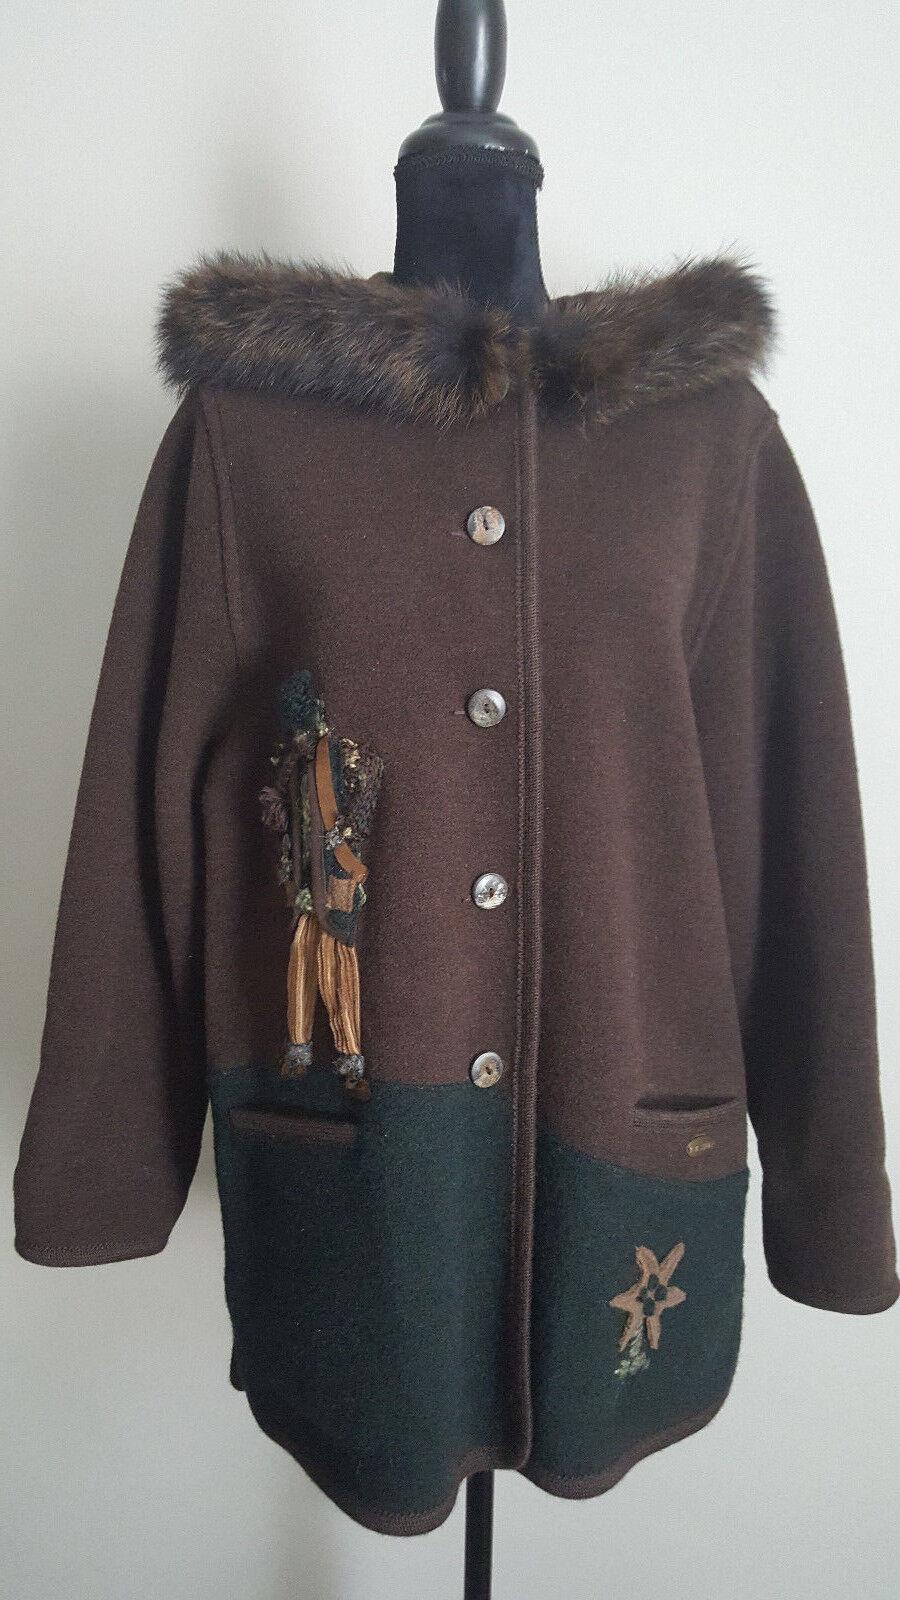 Giesswein Womens Coat 100% Pure Wool Real Fur Size 8